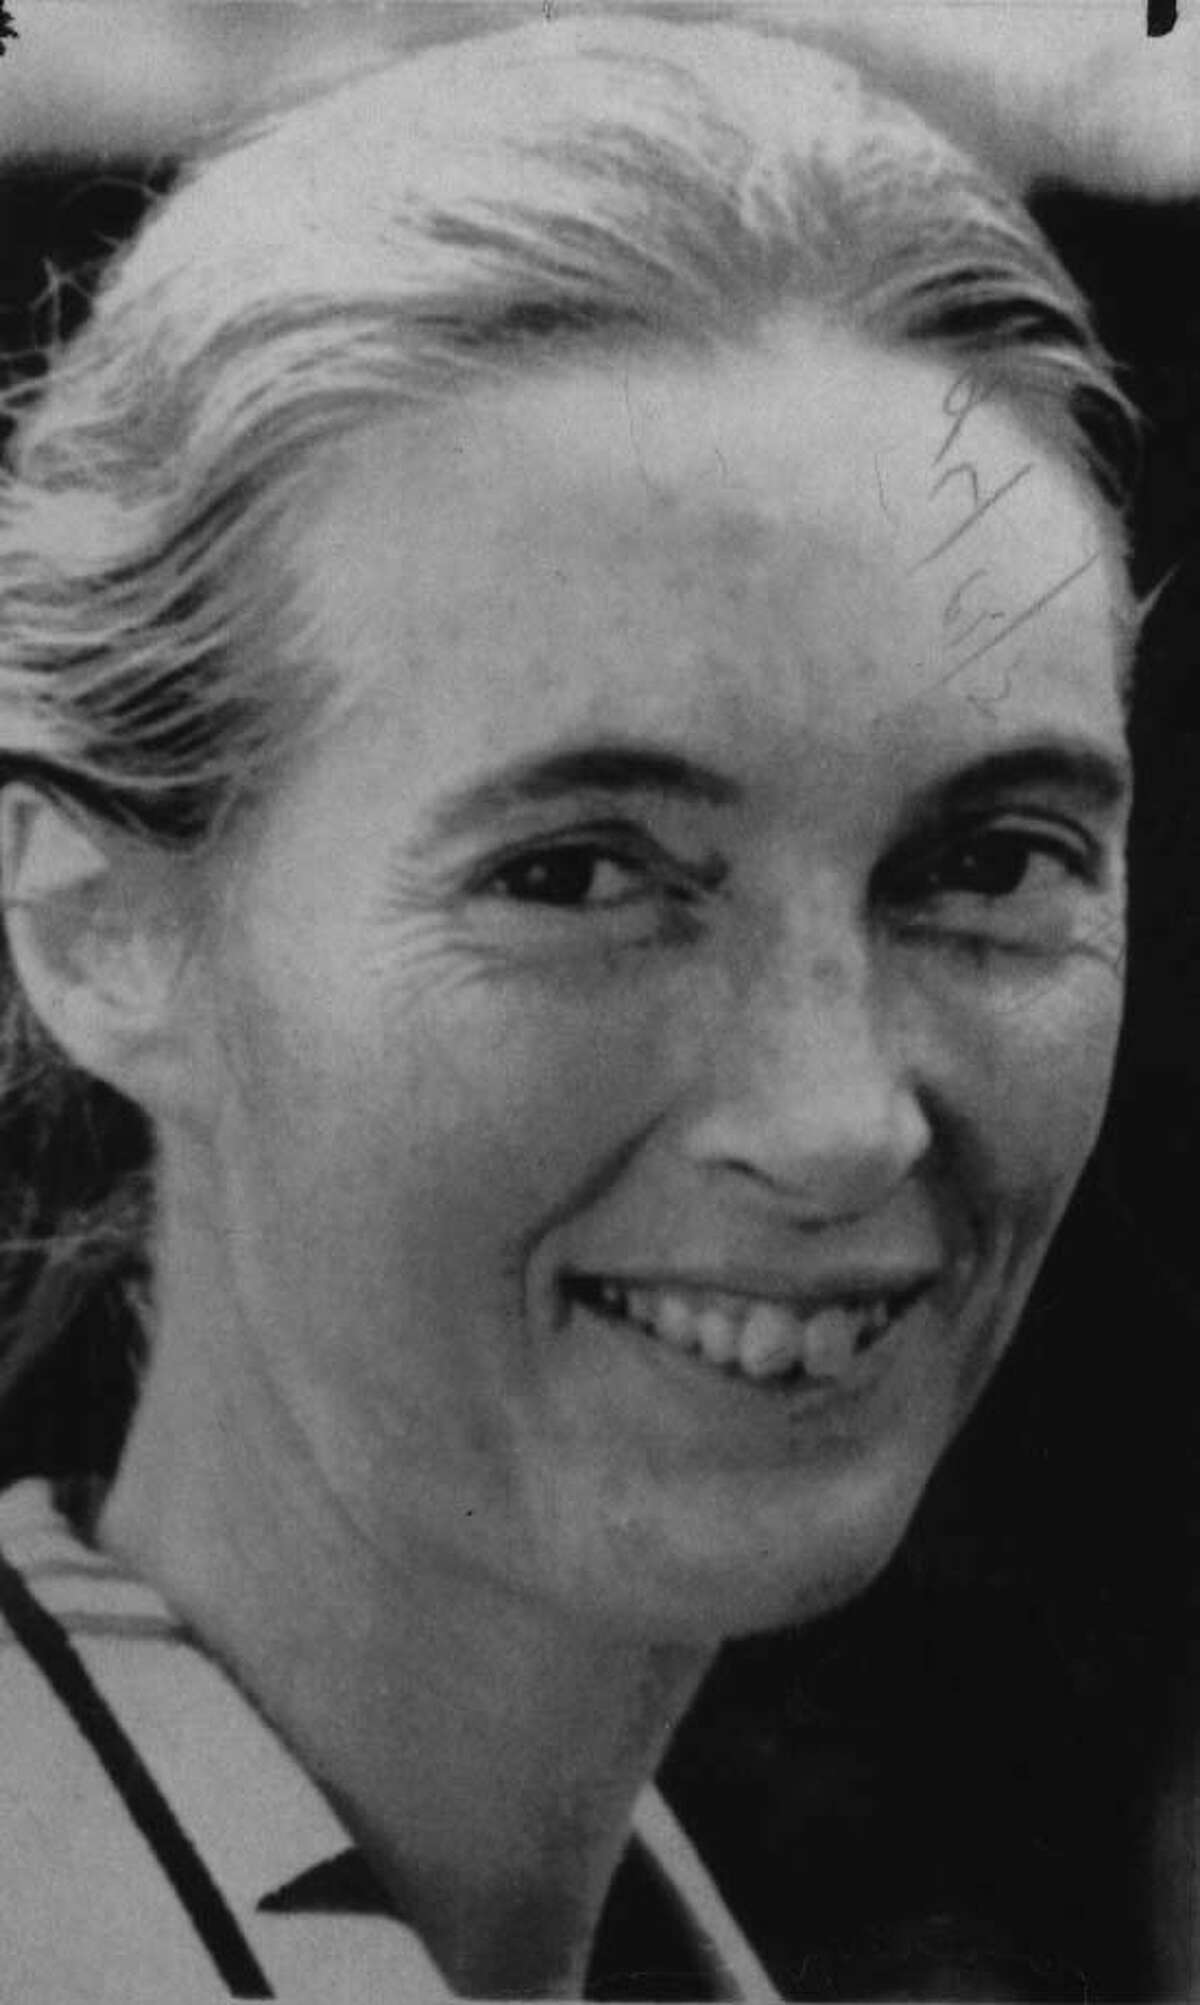 Jane Goodall. 5/12/1976. -1- McBride. (No further information.)